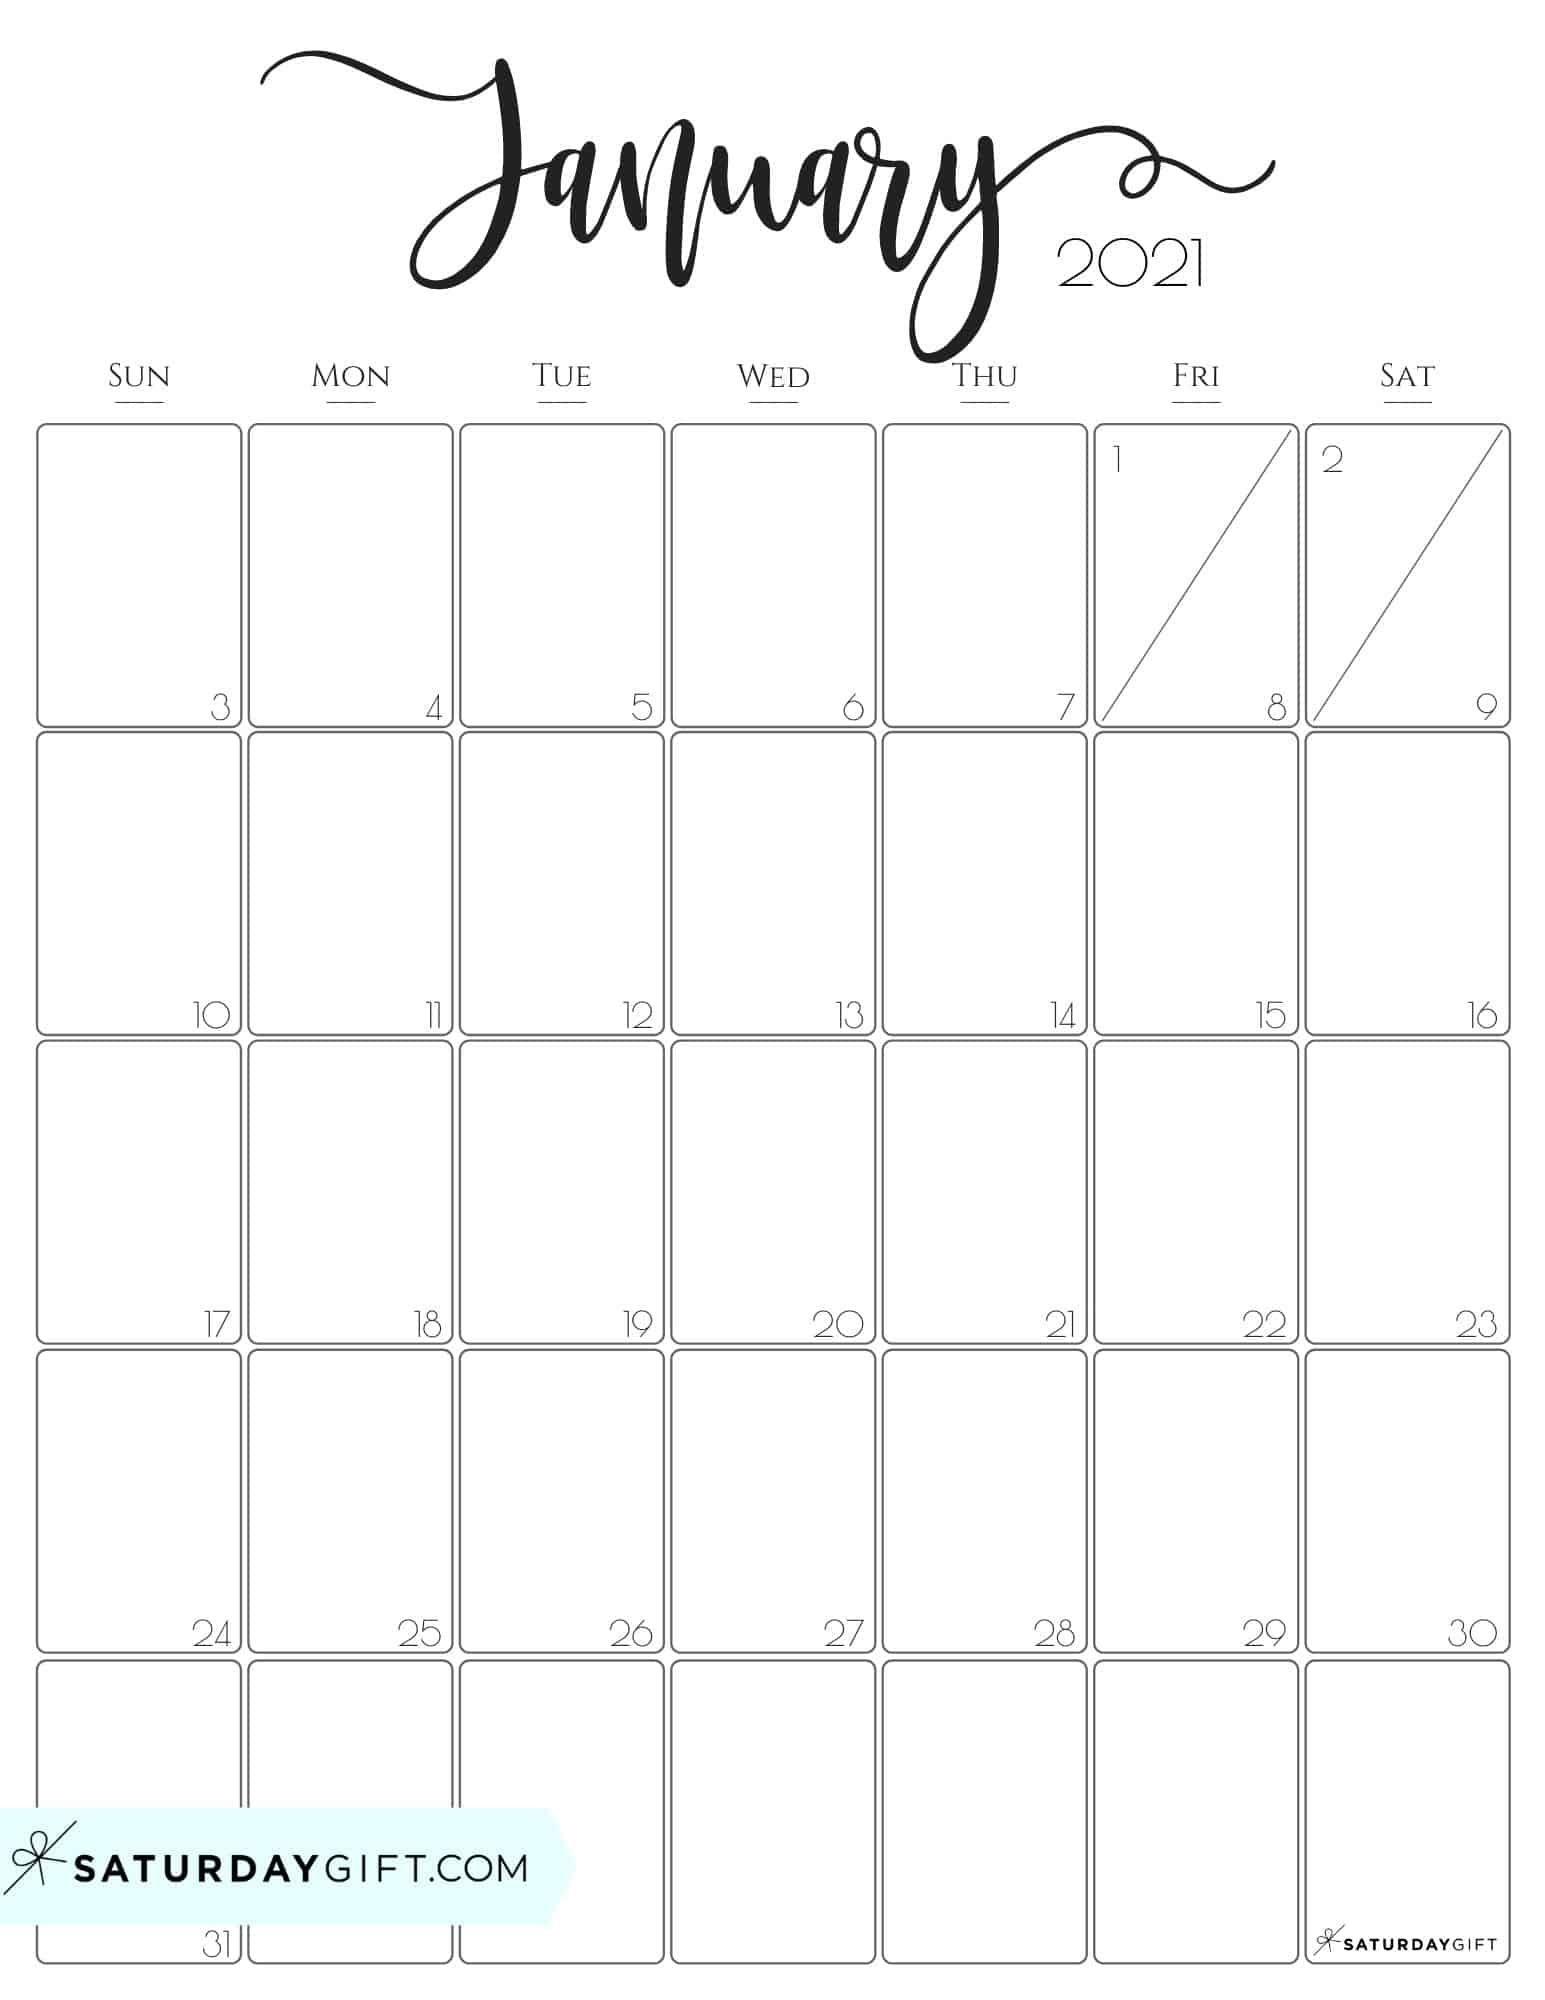 Take November Calendar 2021 Printable Free